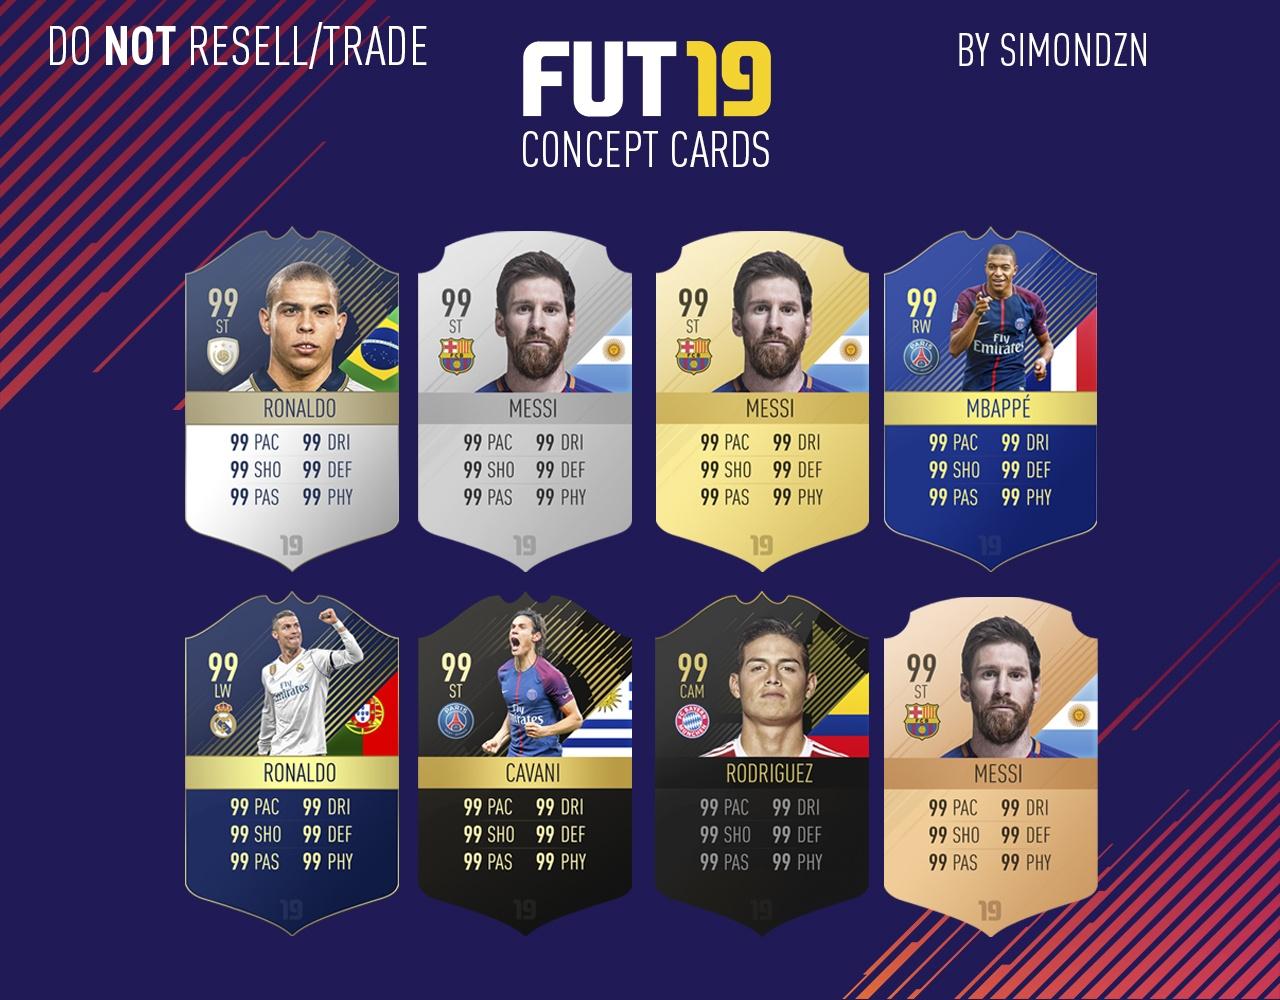 FIFA 19 Concept Cards v2